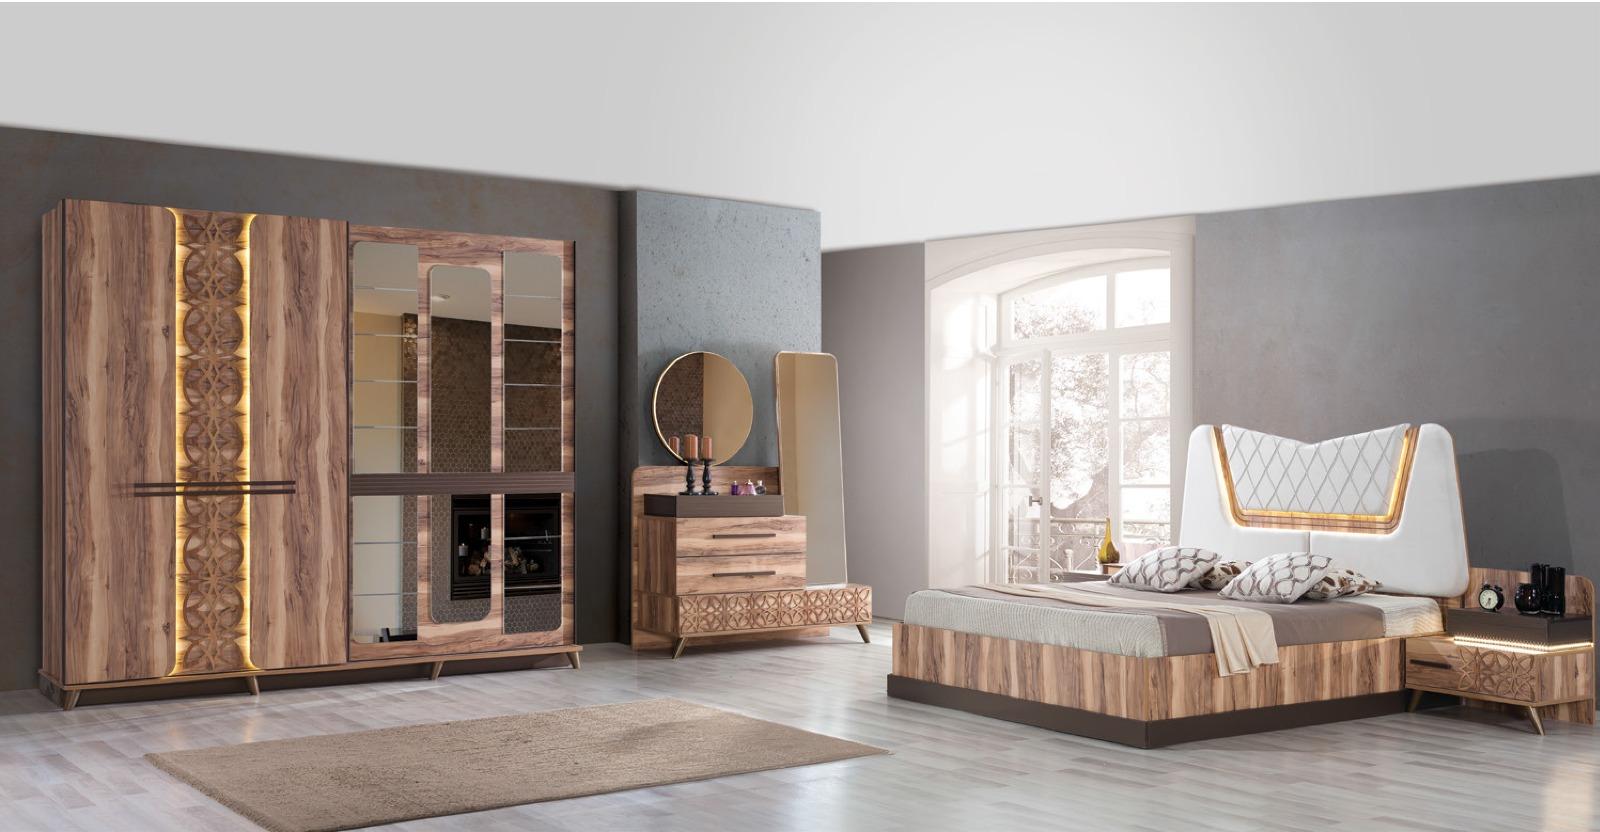 New Design Home Furniture_2